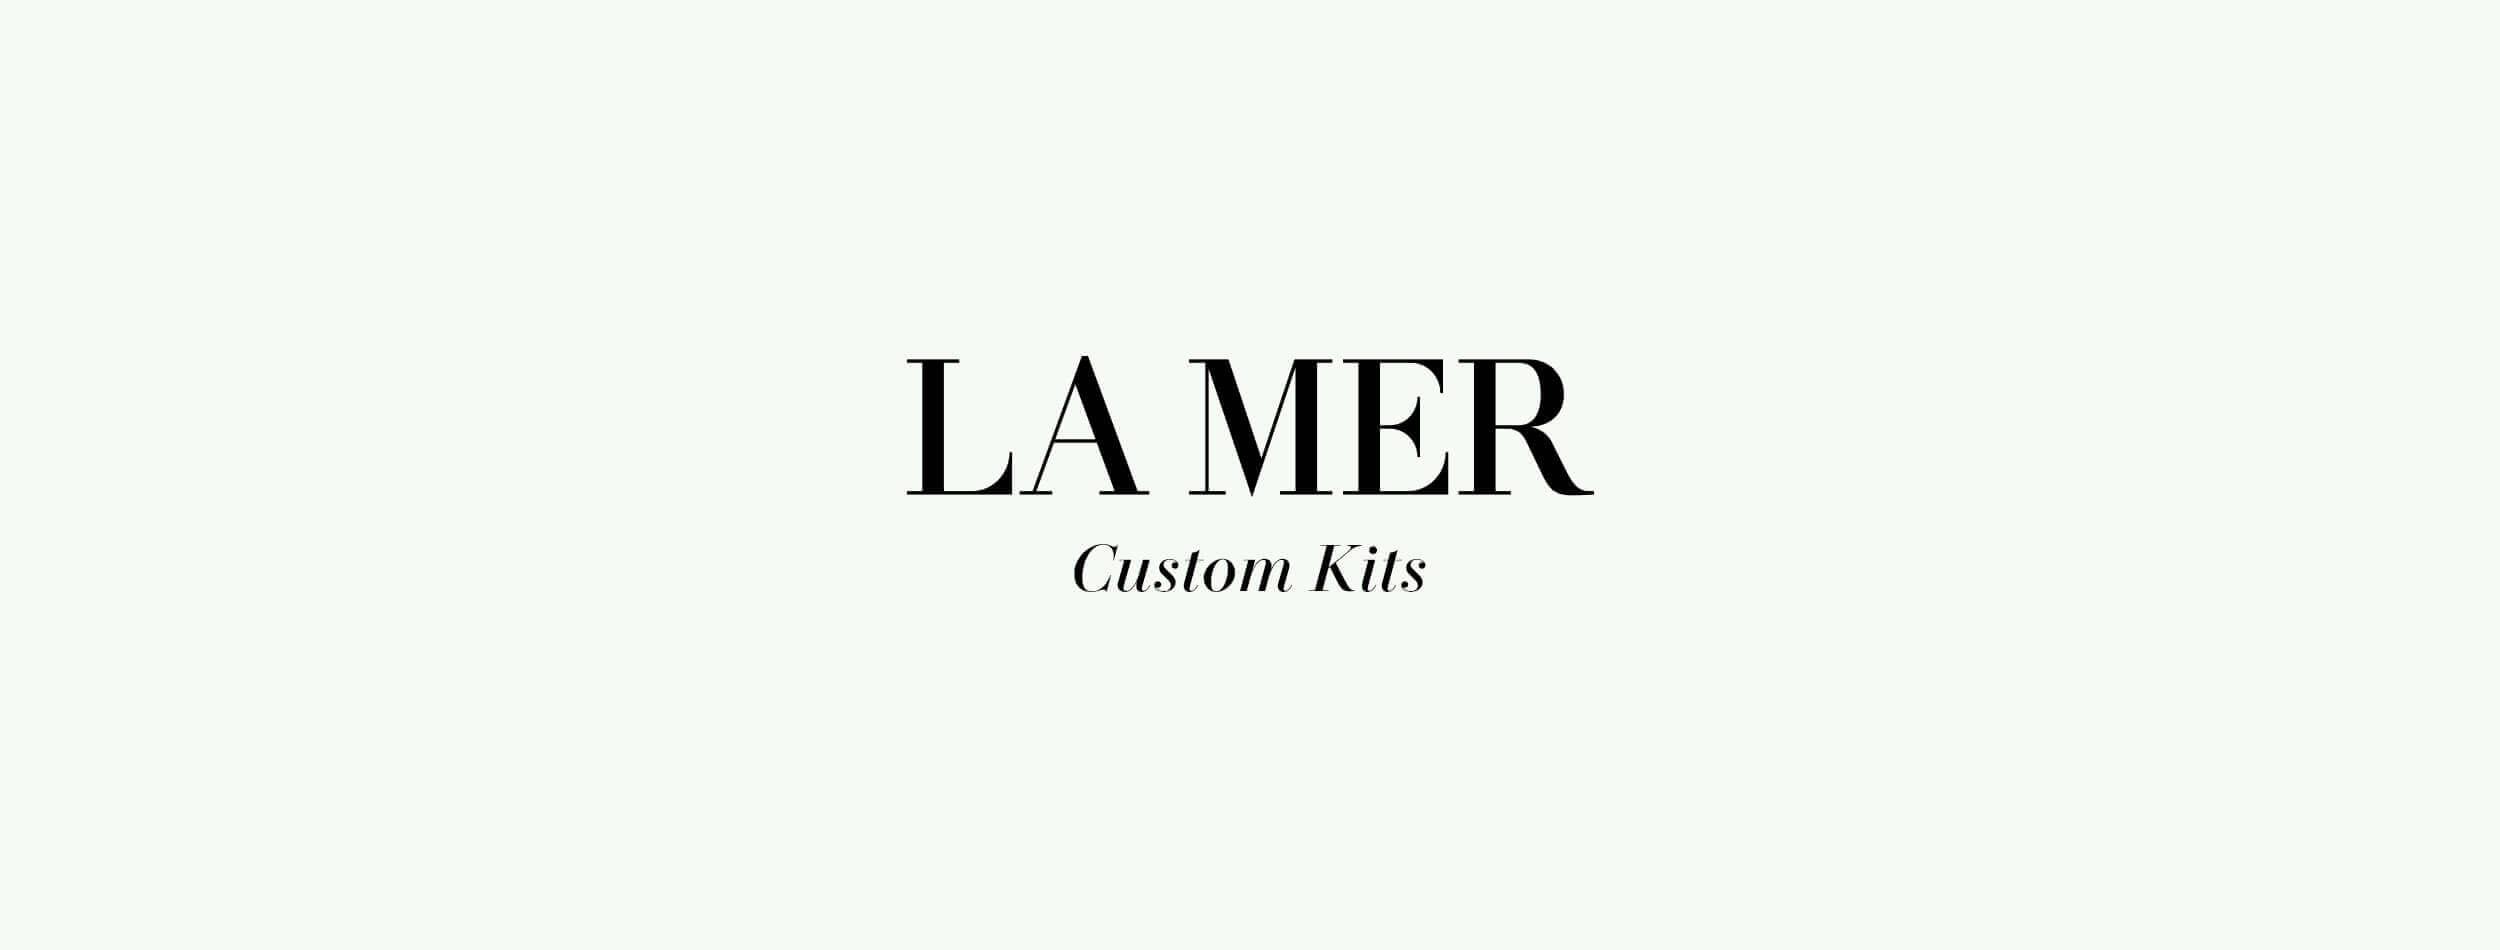 lamer-custom_HERO-IMAGE